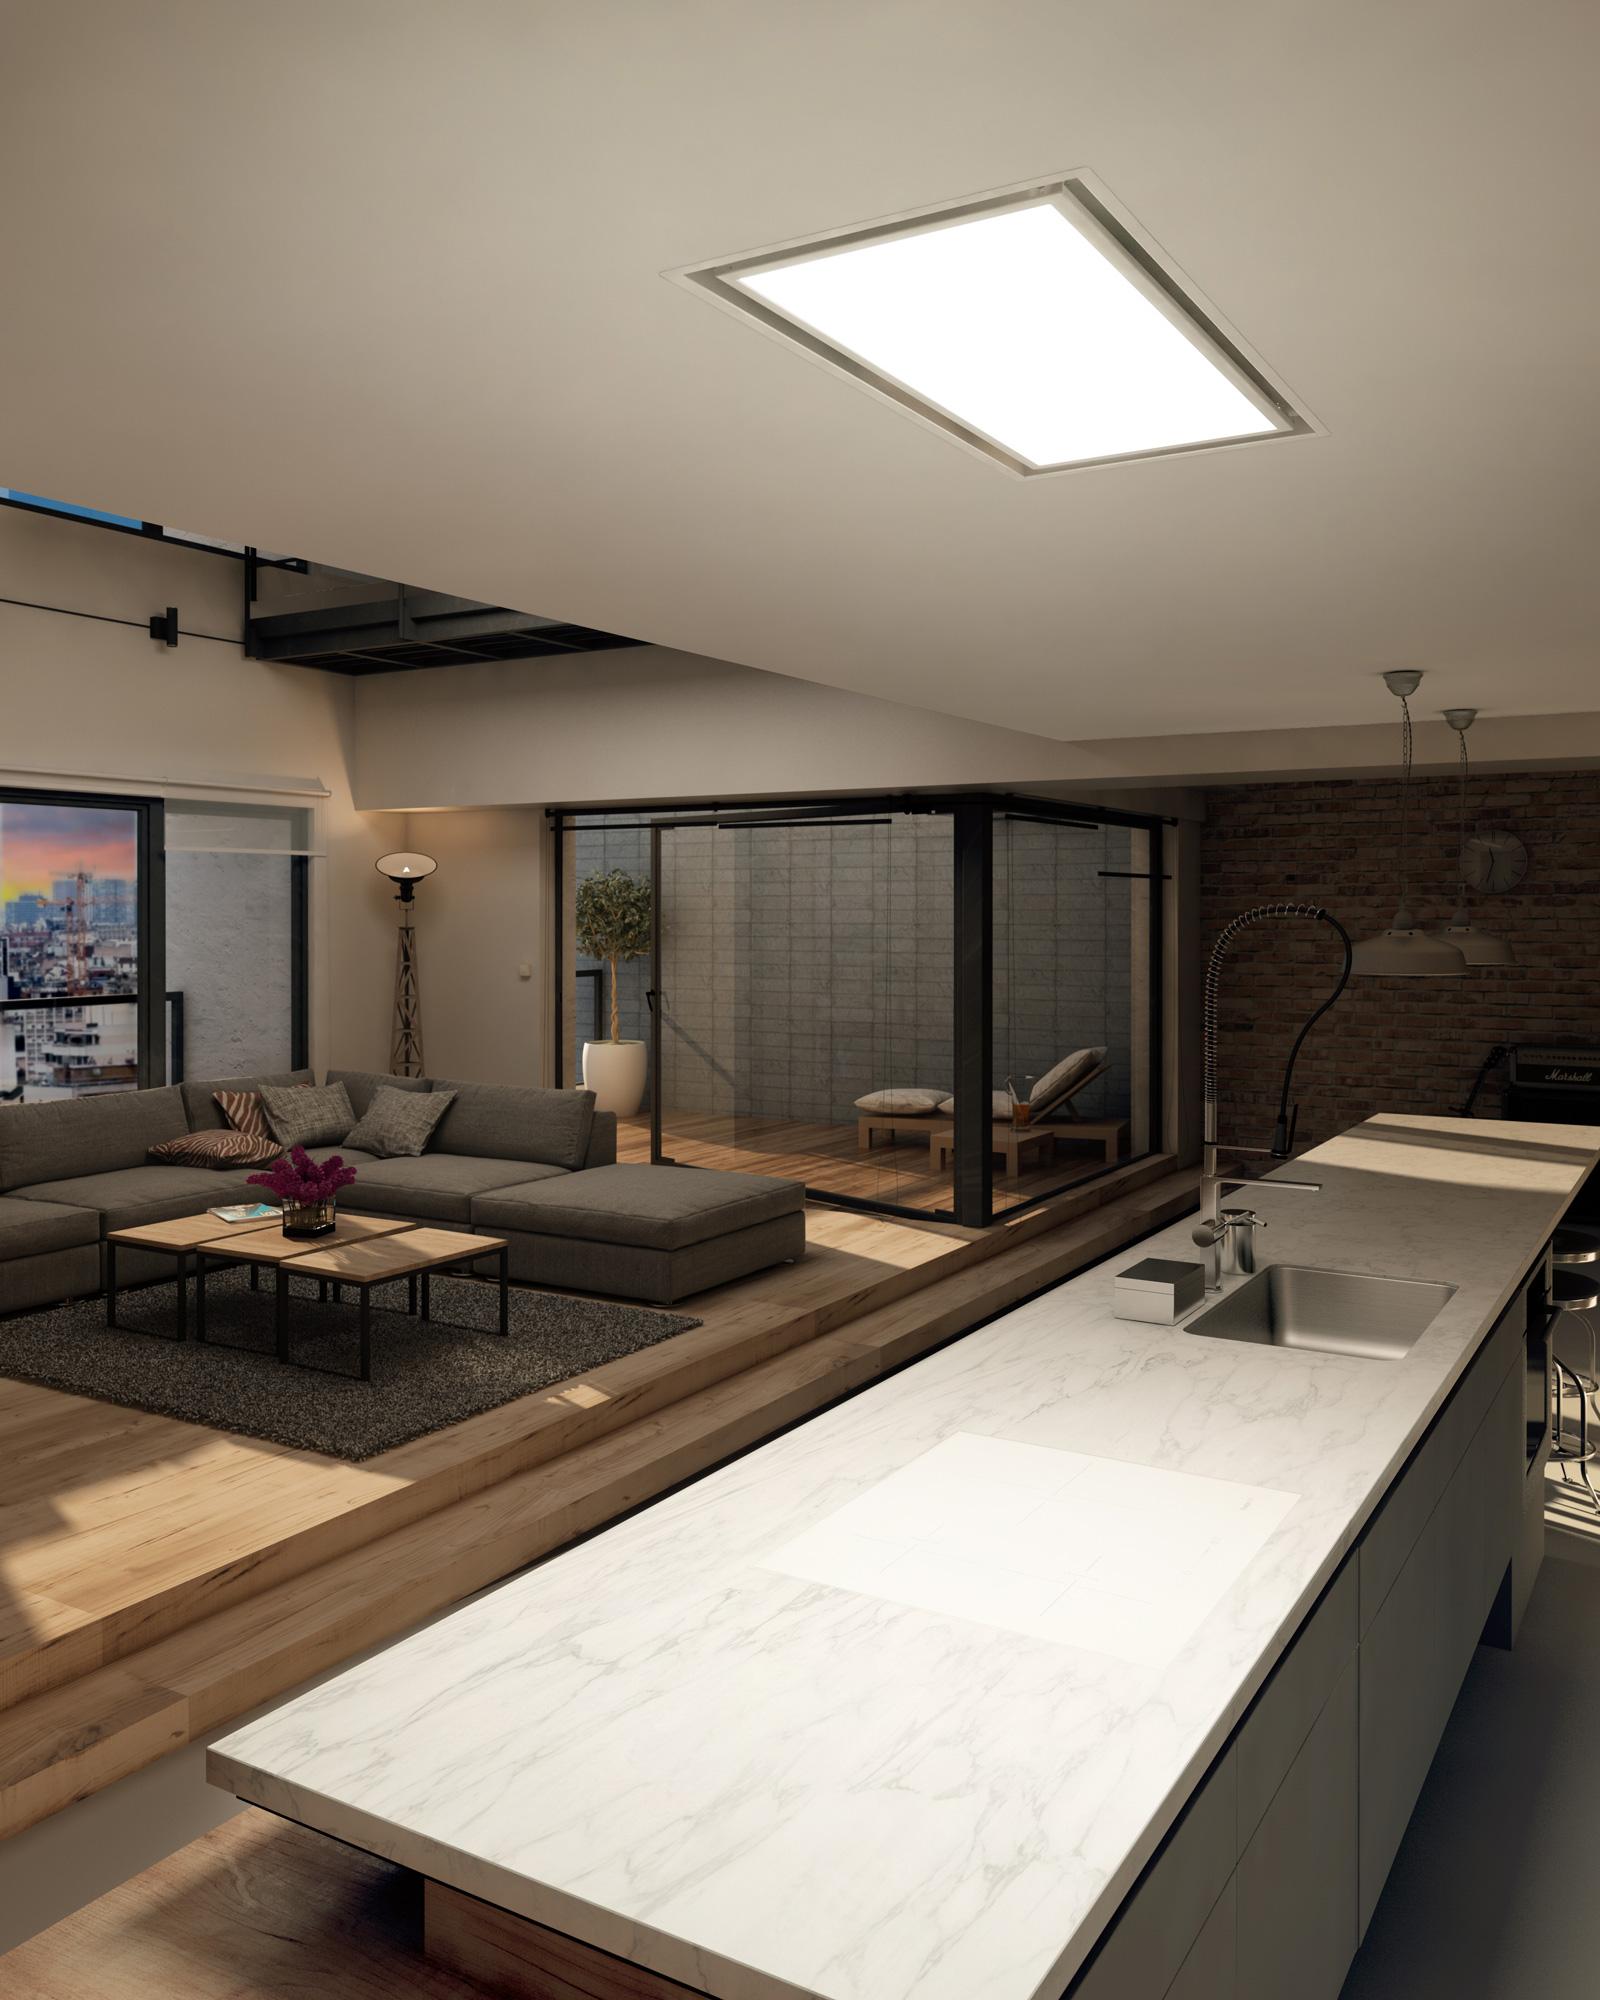 New Bright 360 ceiling hood, Frecan